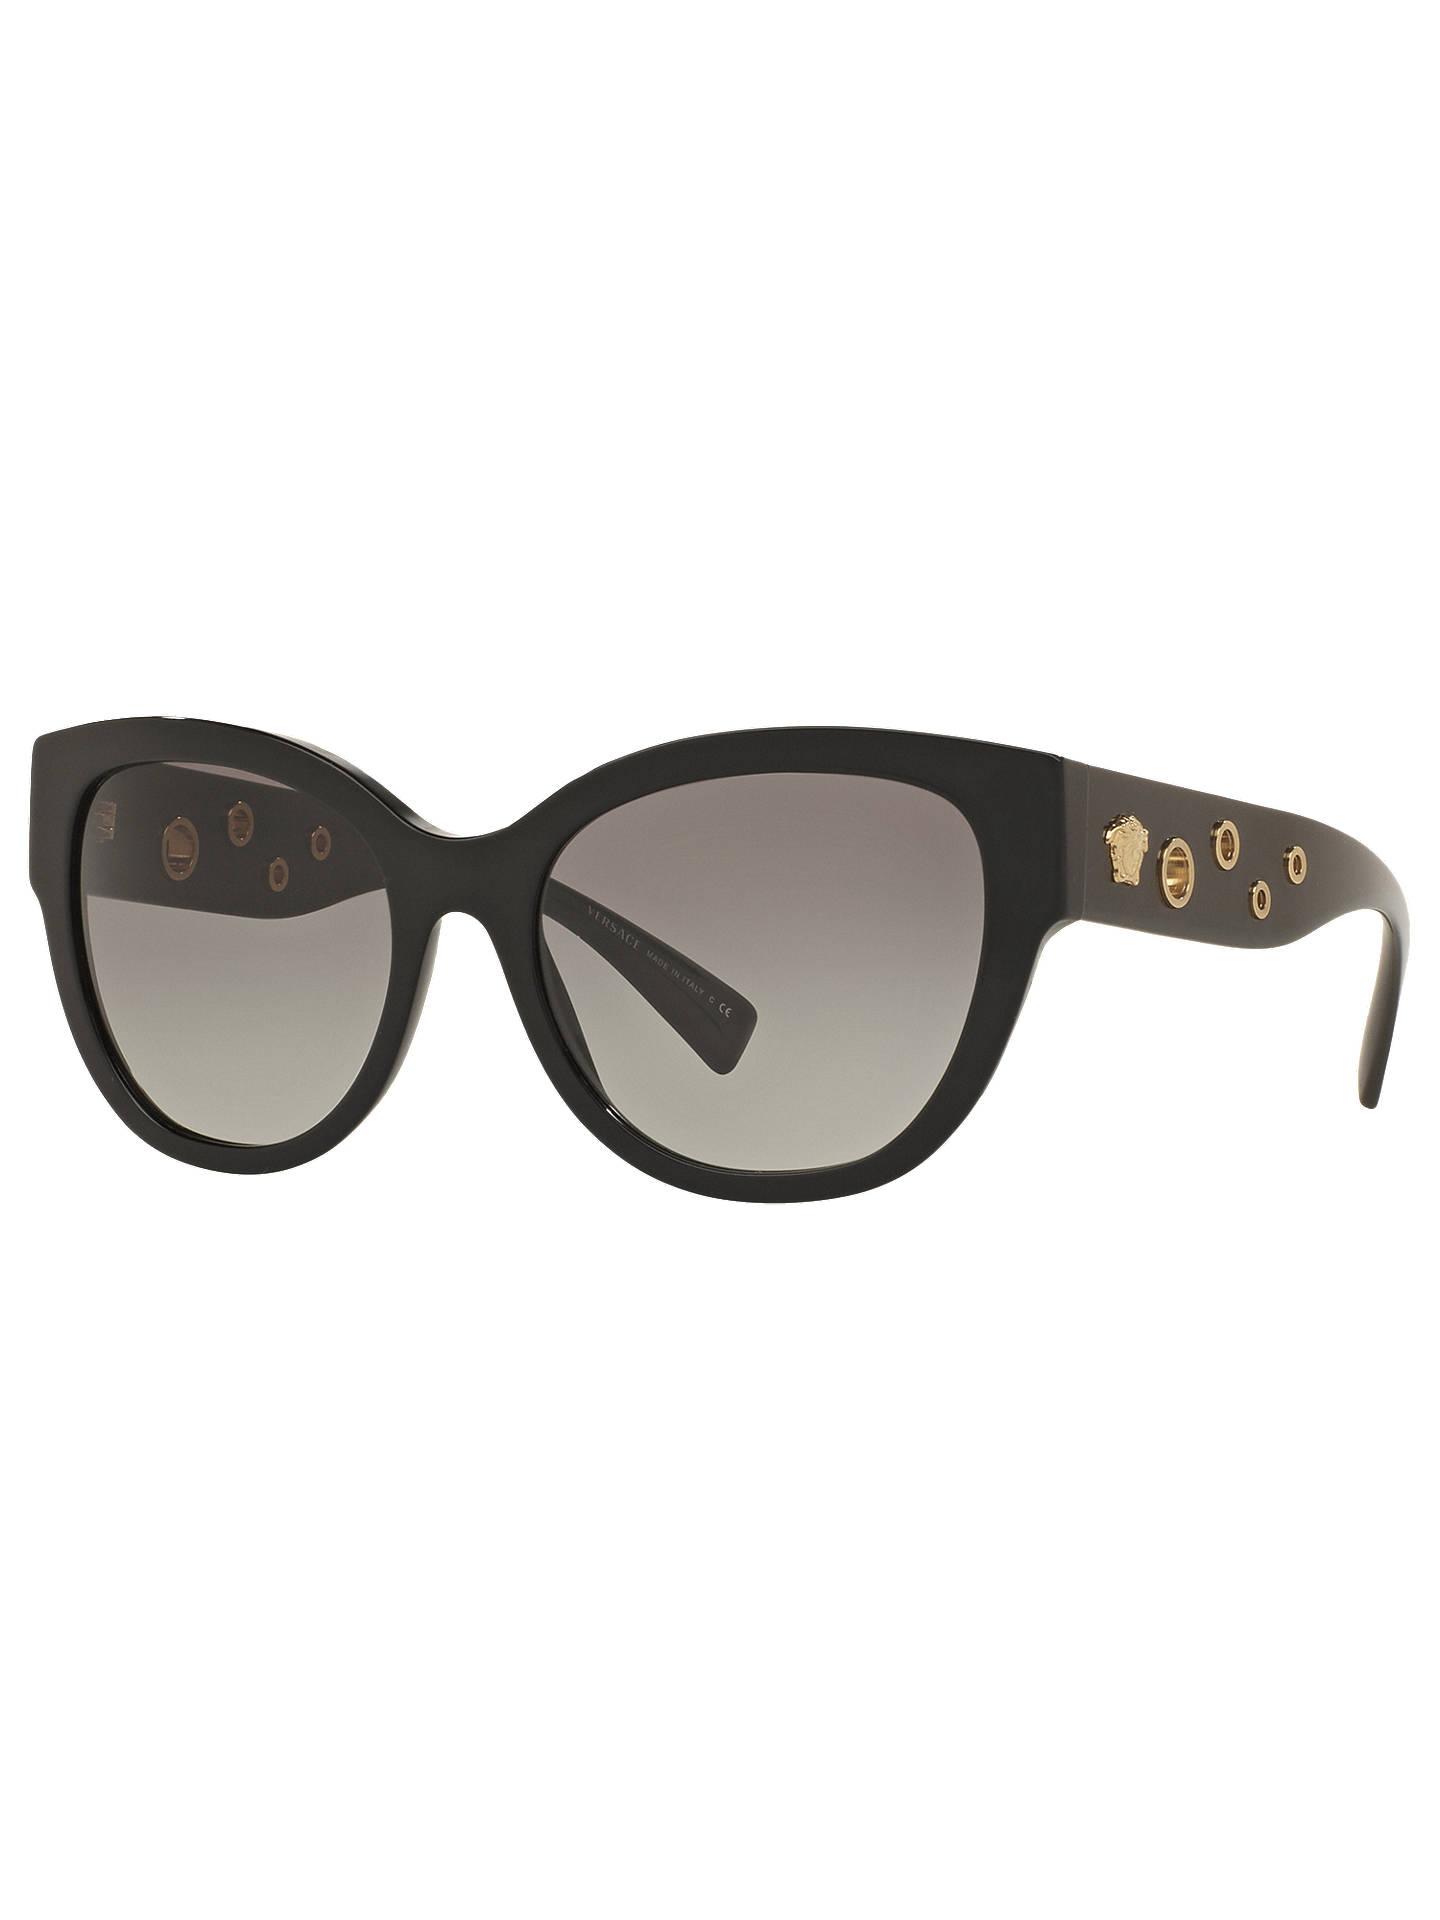 e46d826e0f44 Buy Versace VE4314 Embellished Cat s Eye Sunglasses